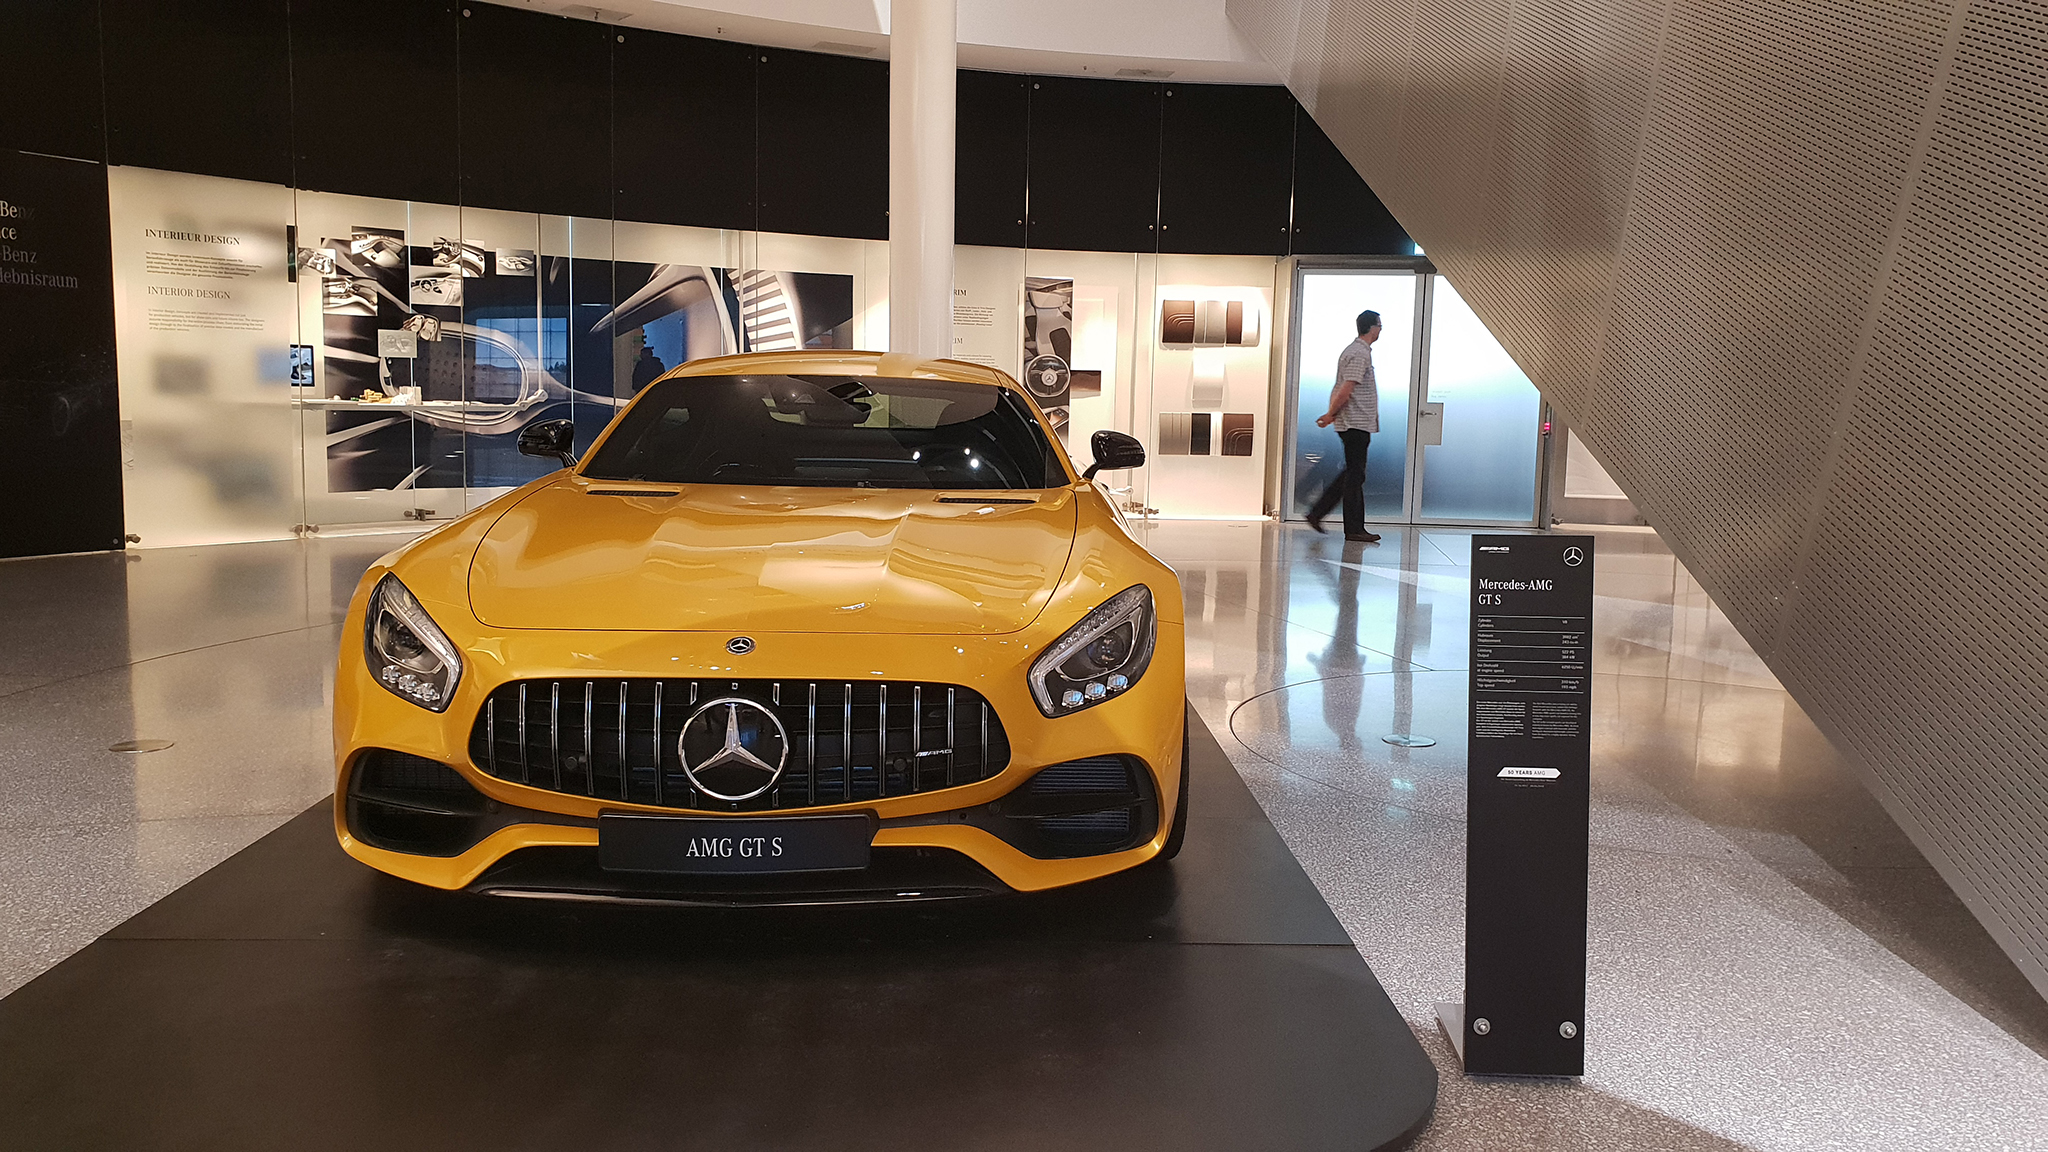 S9-Mercedes-Benz Museum-tinhte-42.jpg